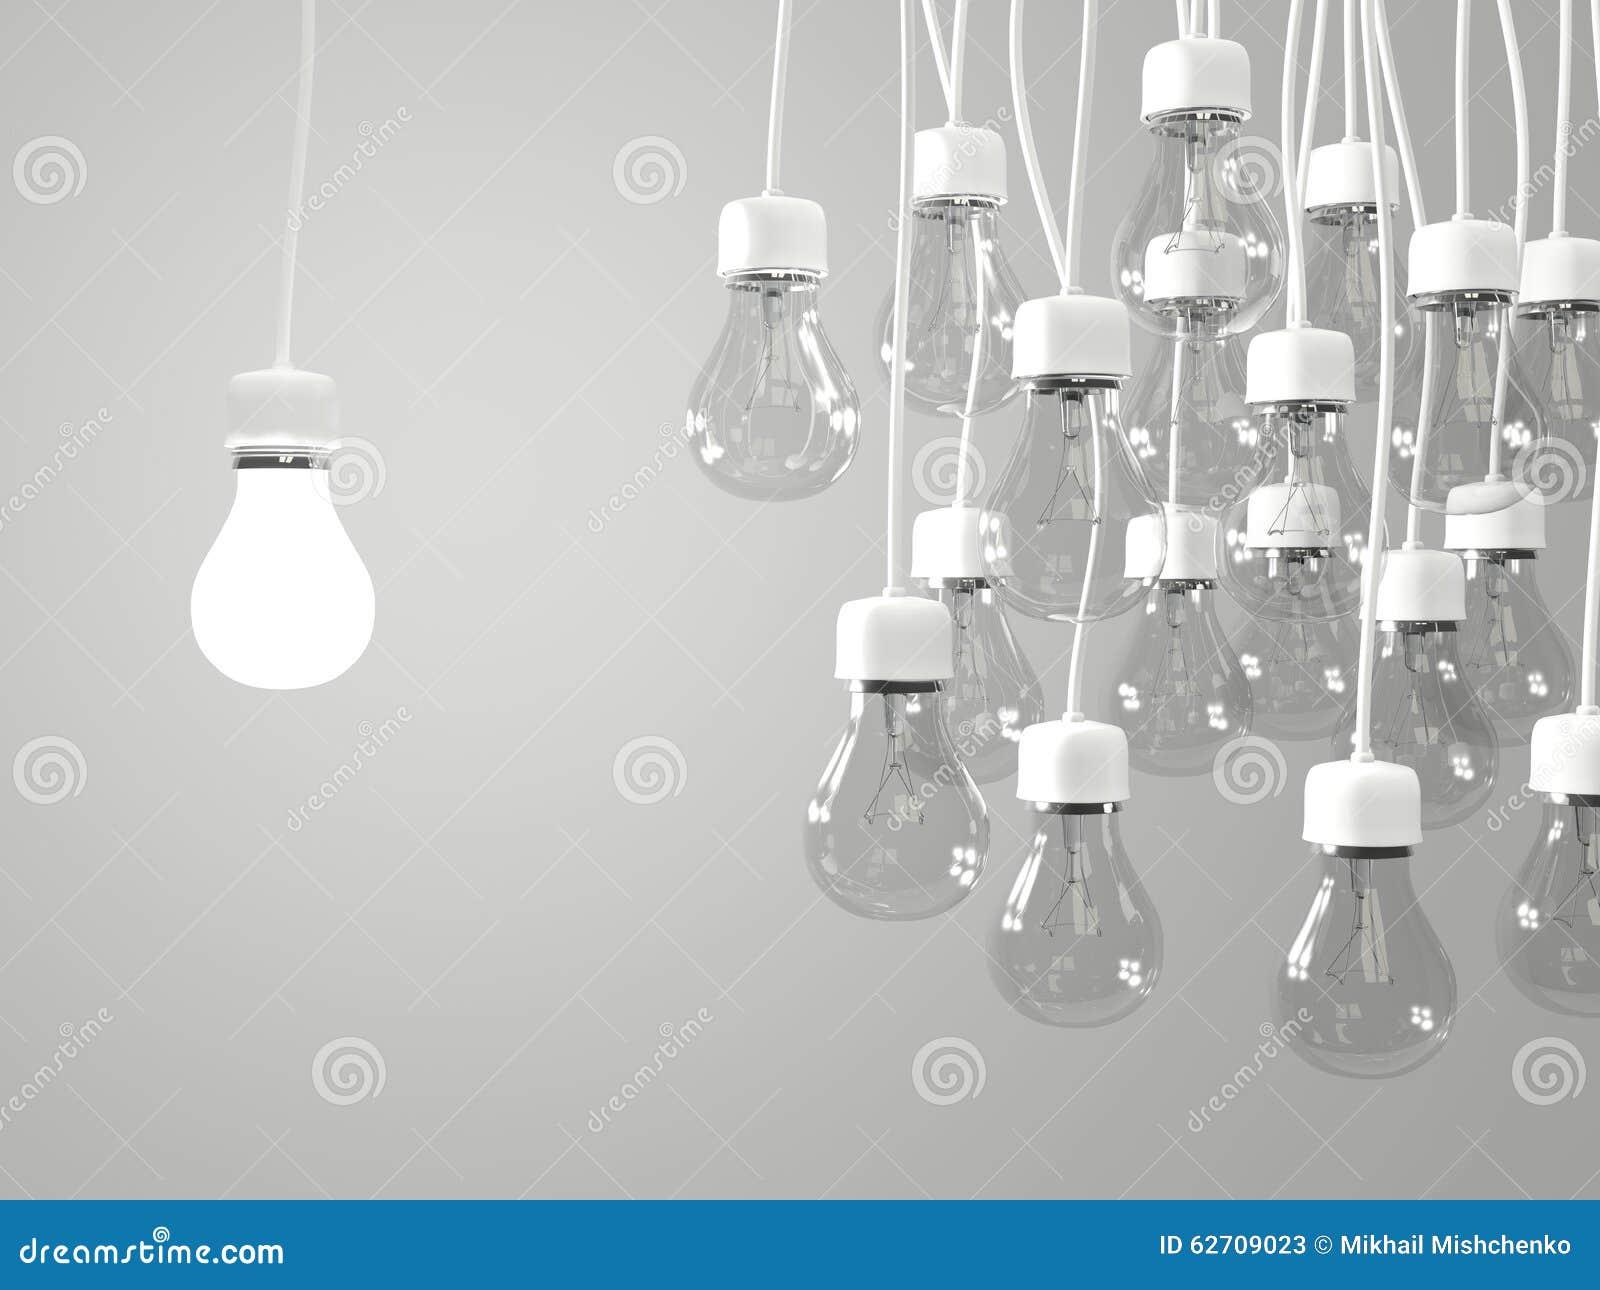 Bright Light Bulb With Regular Light Bulbs Stock Illustration Image 62709023